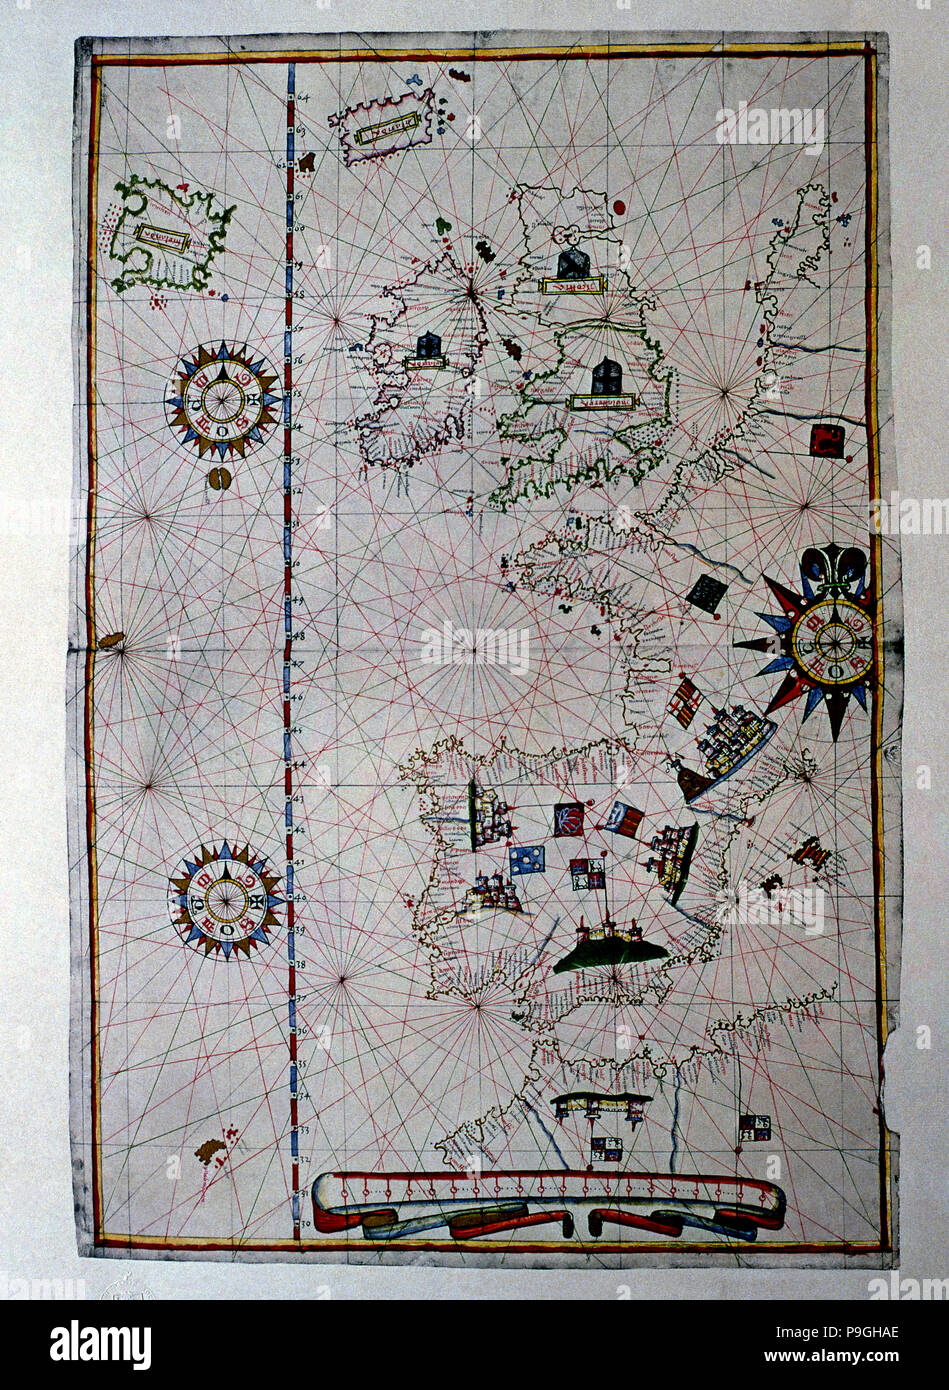 Atlas of Joan Martines, Messina, 1582. Portulan chart of Western Europe showing the Iberian penin… Stock Photo